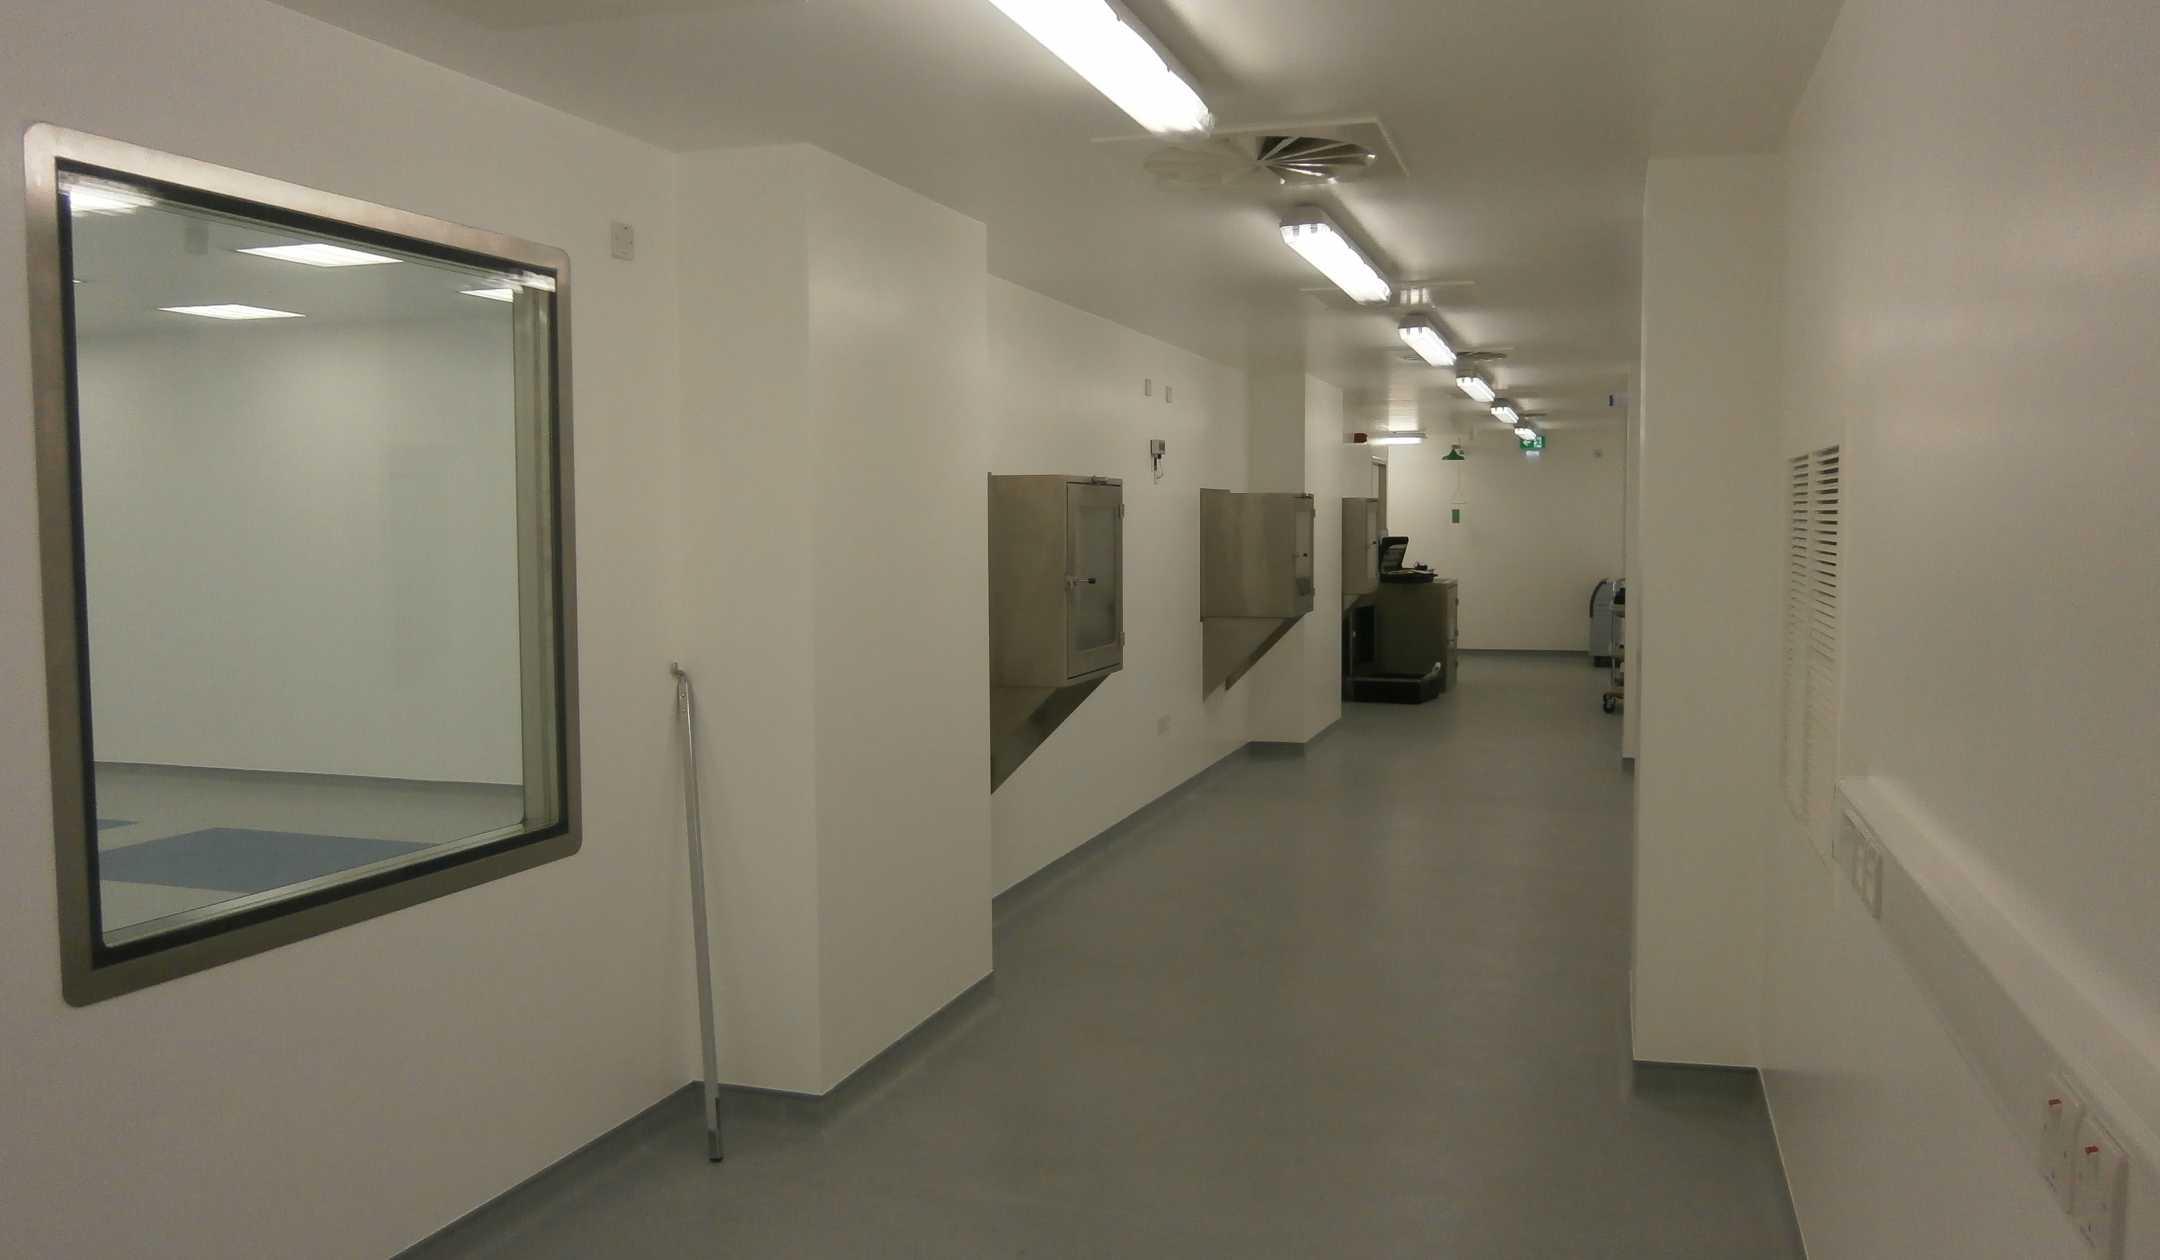 Laboratory Iso Class 8 Athlone